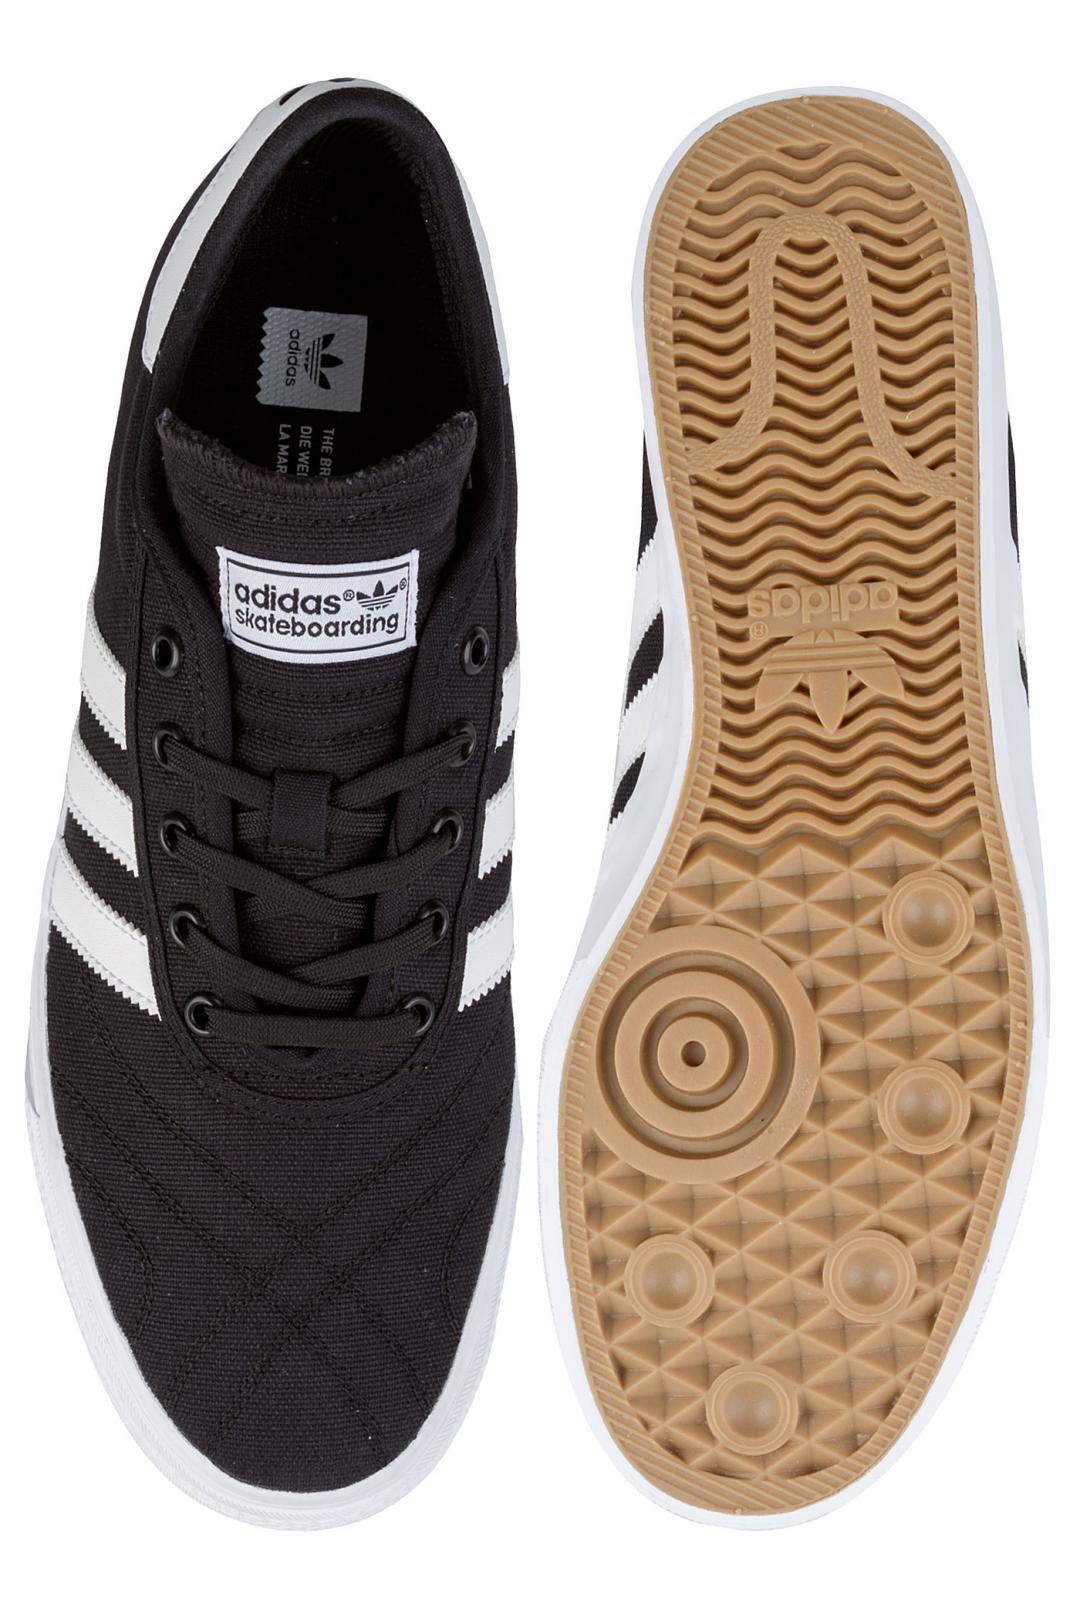 Uomo adidas Skateboarding Adi Ease Premiere core black white gum | Scarpe da skate